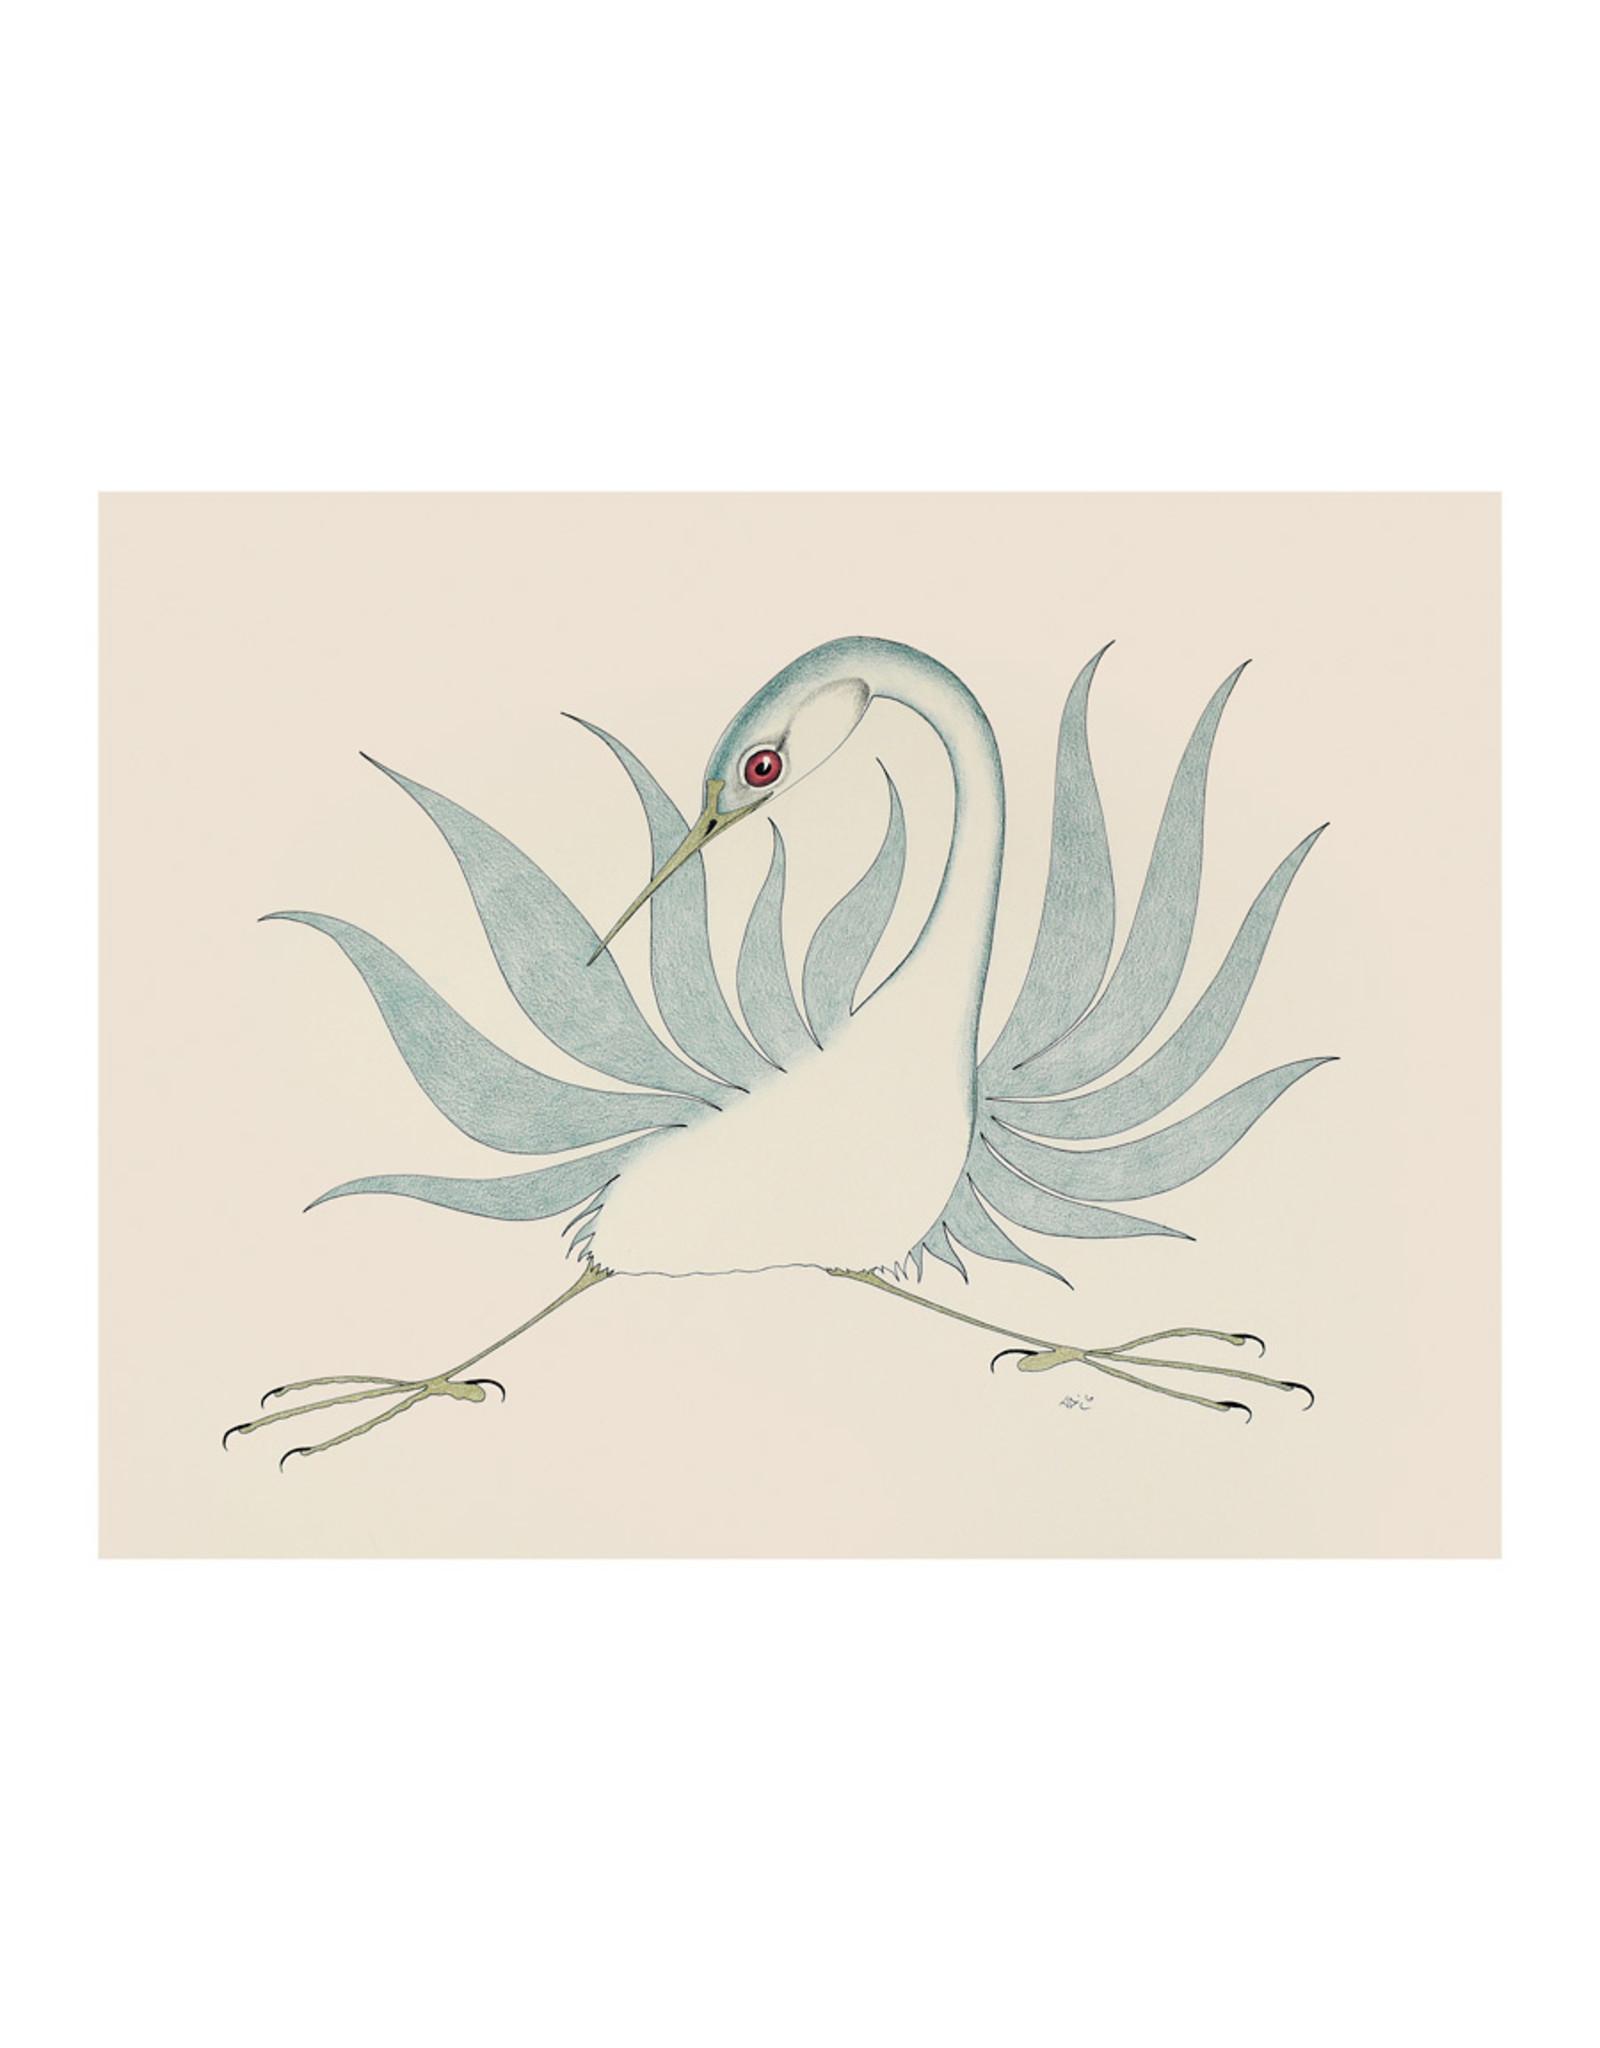 Cape Dorset Art Card: Untitled (Crane)